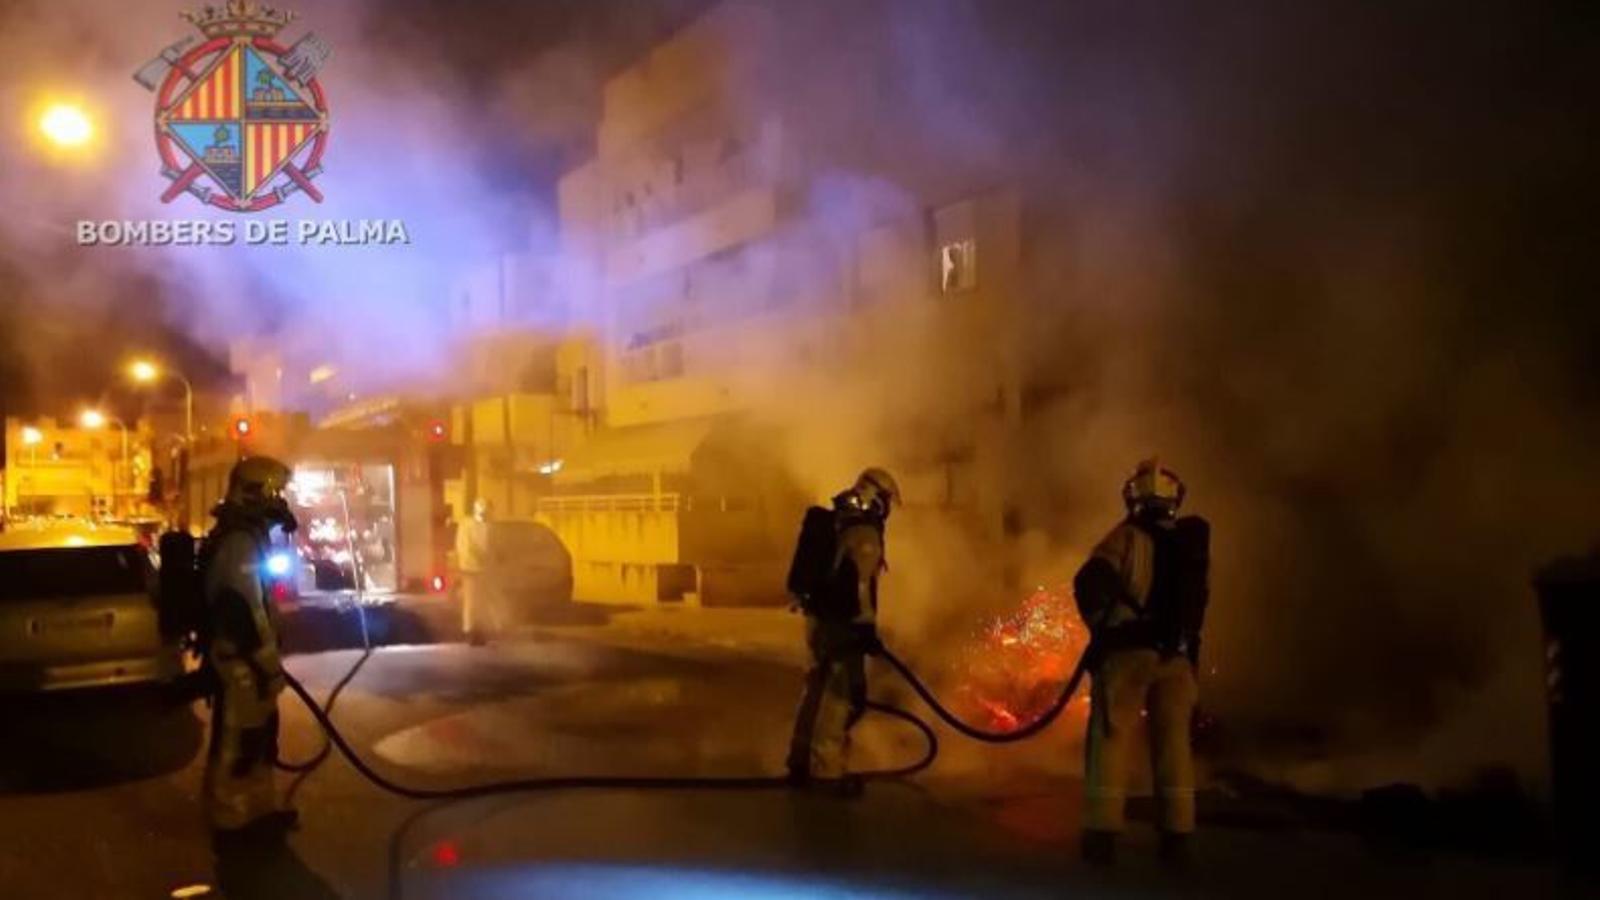 Els bombers apagant el foc del carrer Biniali. / @BOMBERSDEPALMA